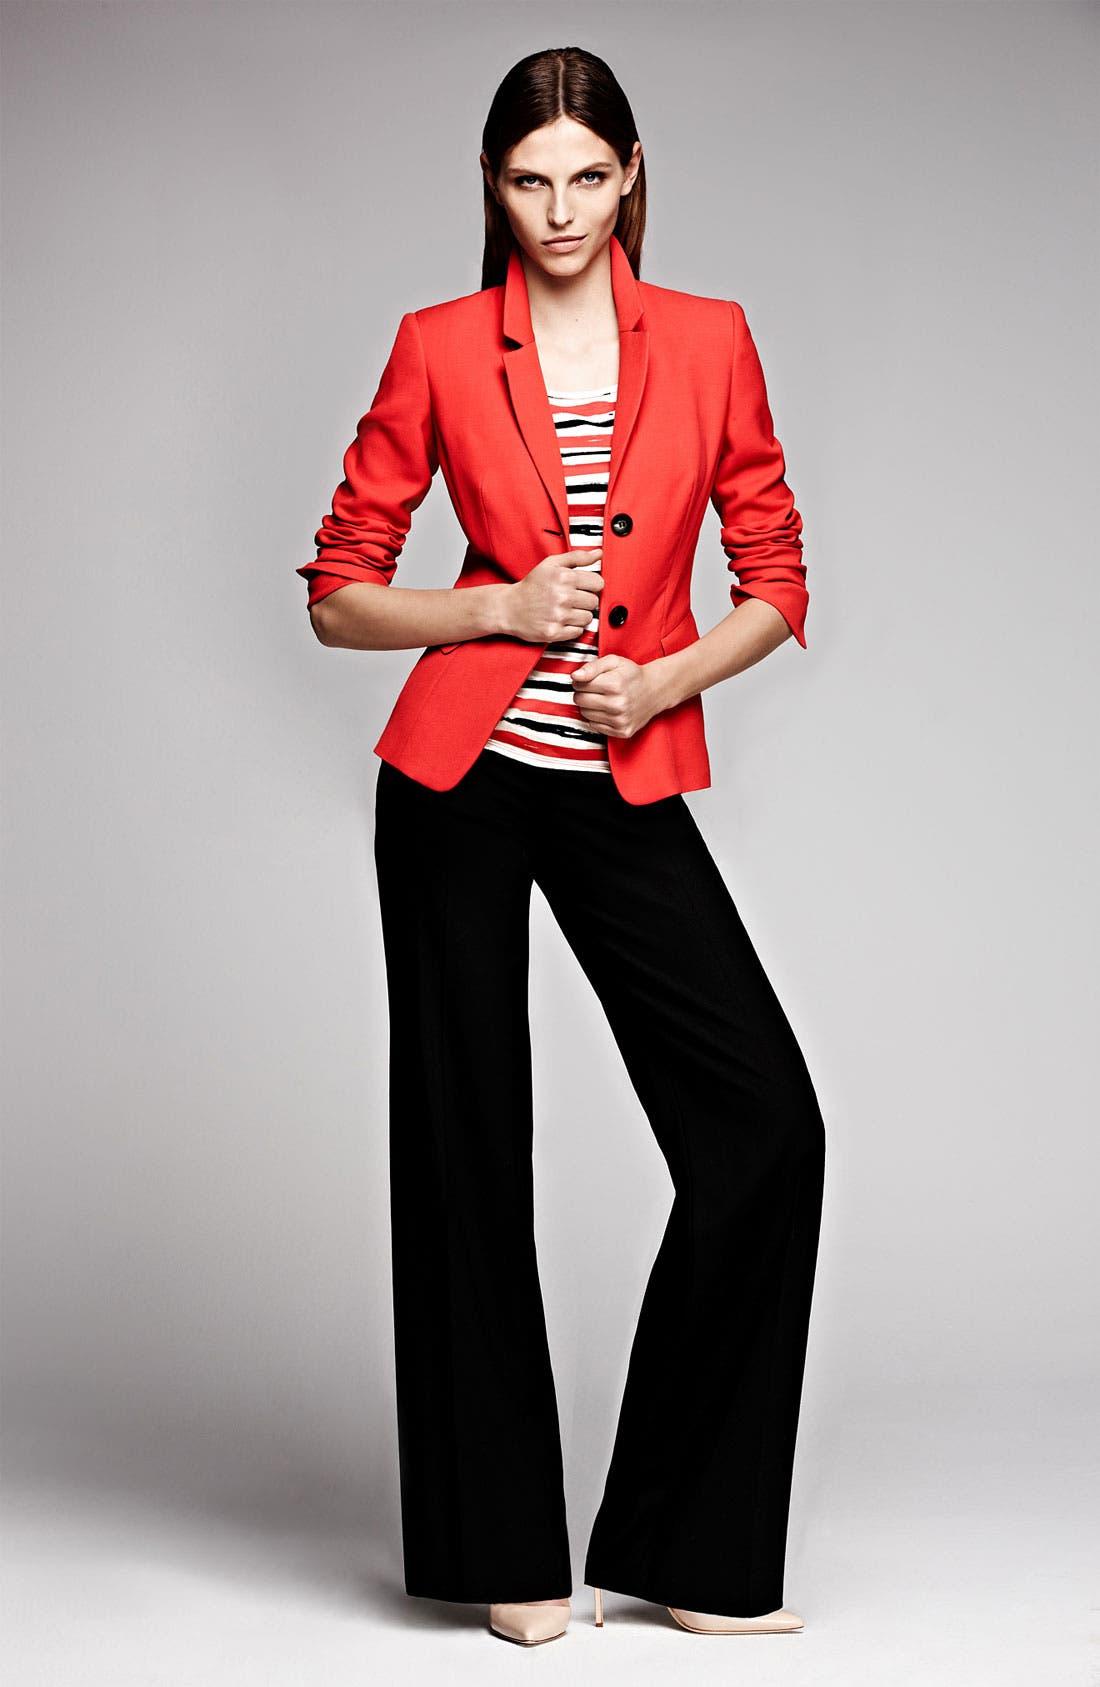 Main Image - Lafayette 148 New York Jacket, Tee & Trousers